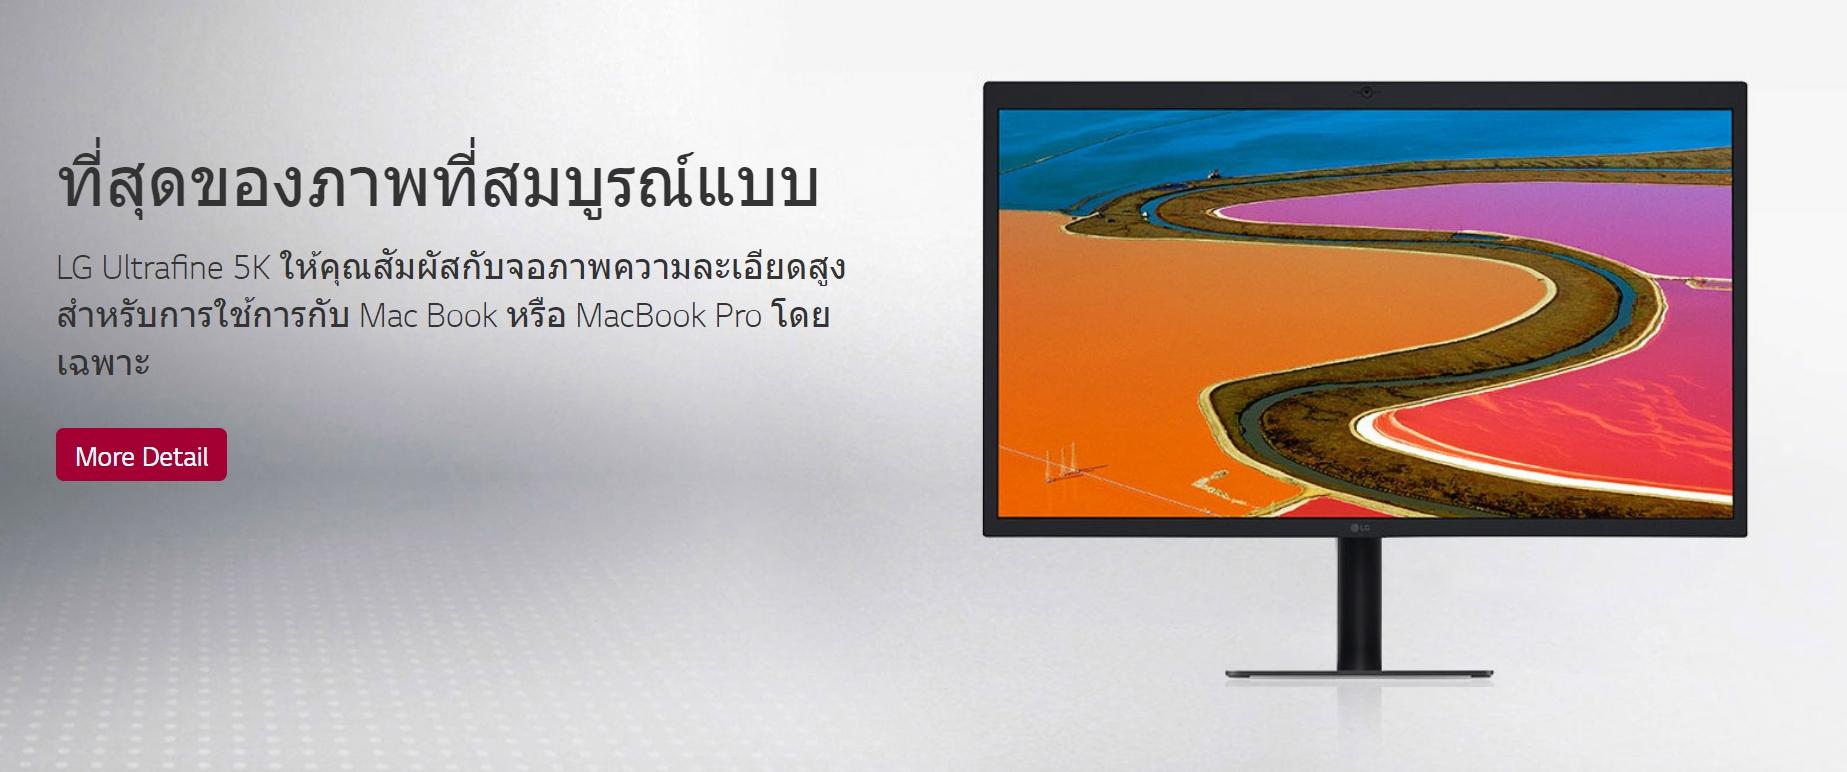 LG UltraFine 5K display